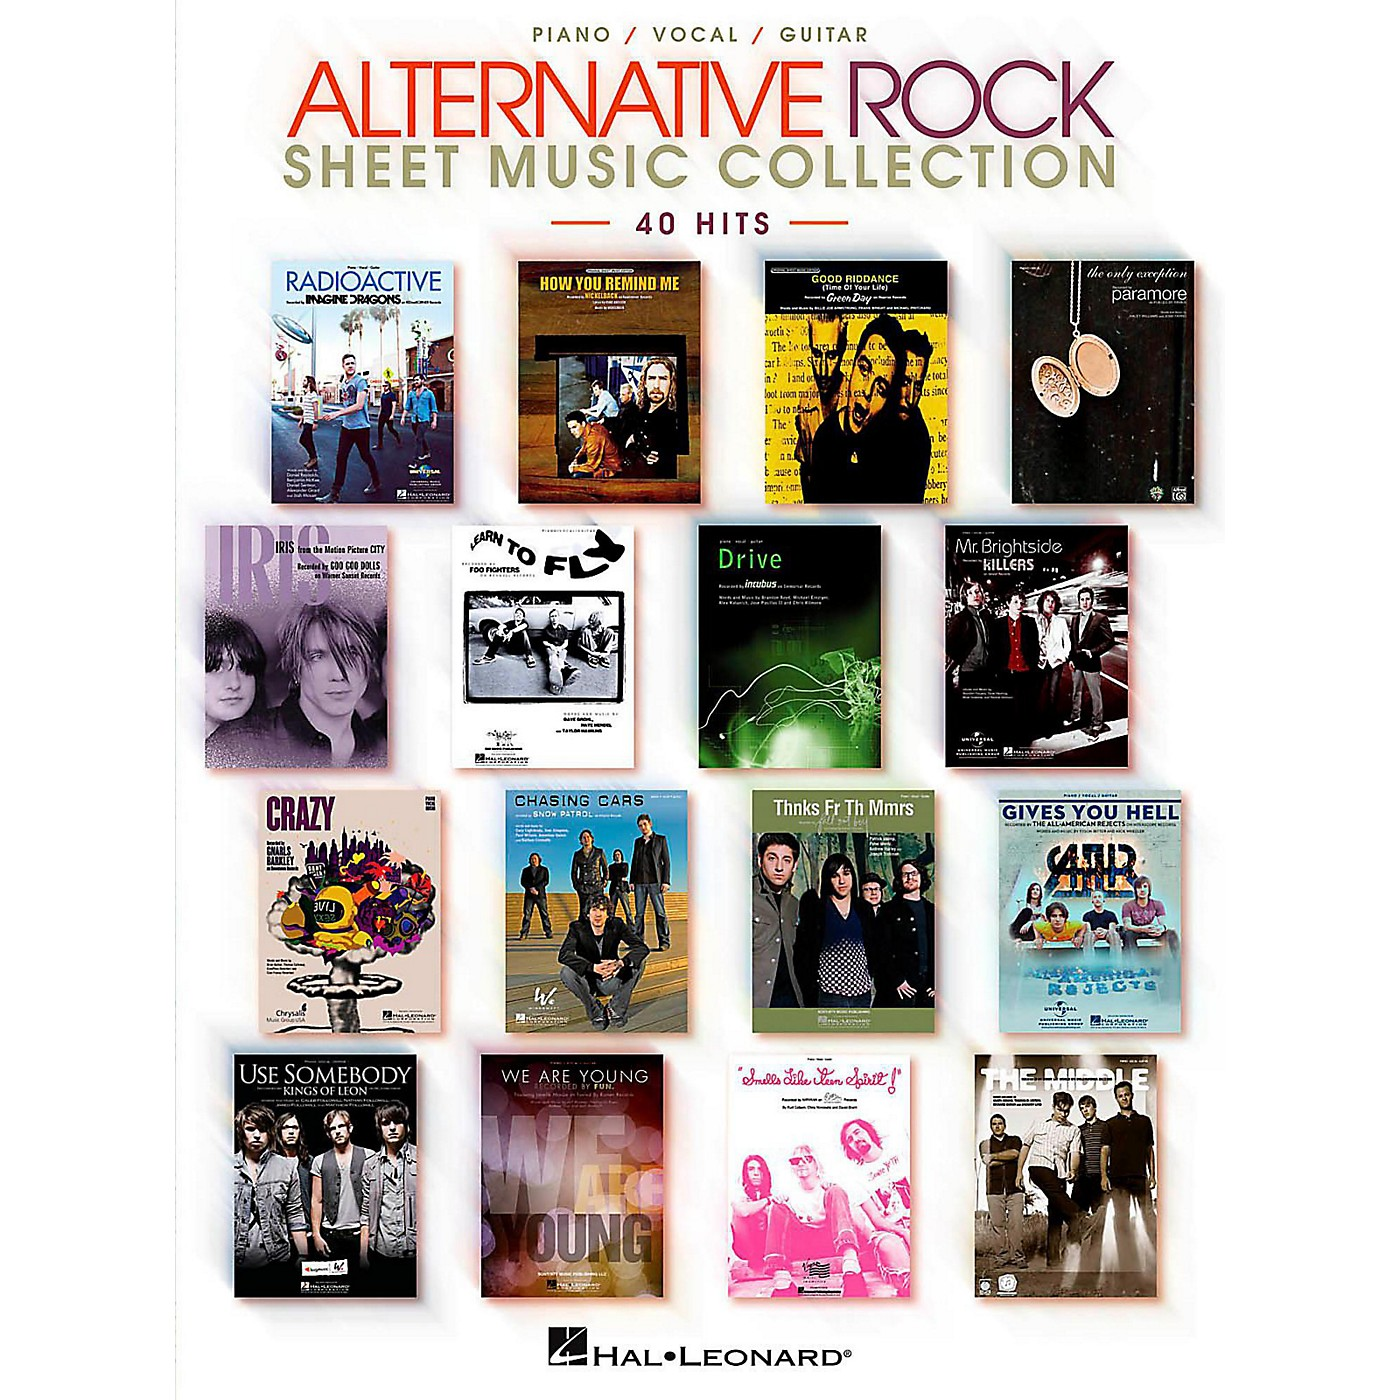 Hal Leonard Alternative Rock Sheet Music Collection Piano/Vocal/Guitar Songbook thumbnail